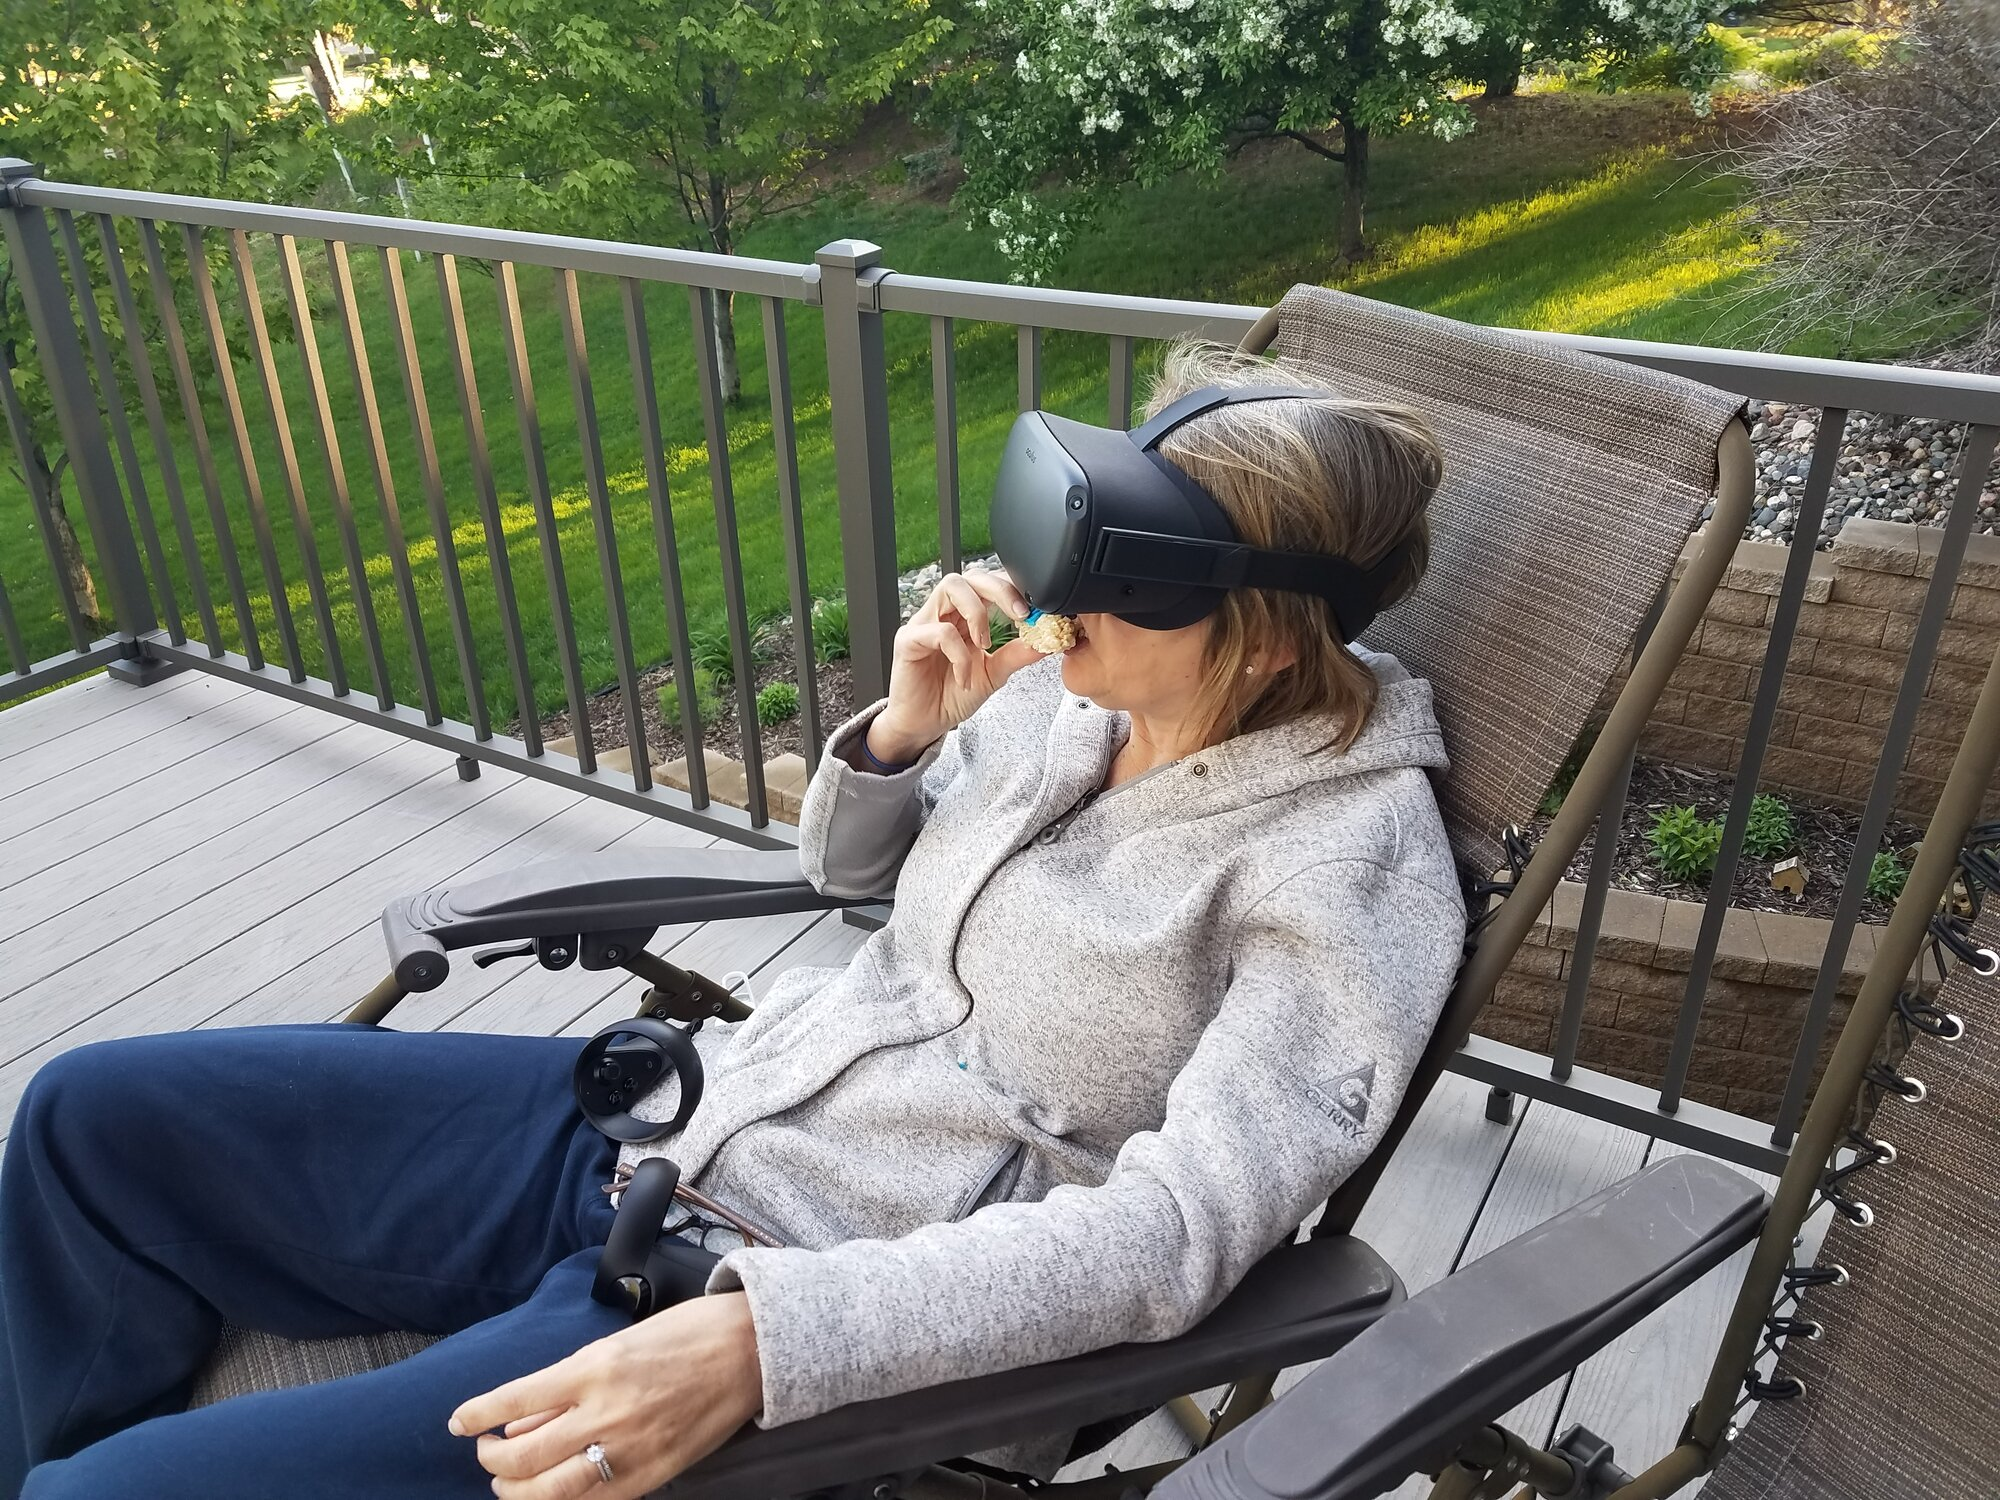 Oculus Quest | [H]ard|Forum